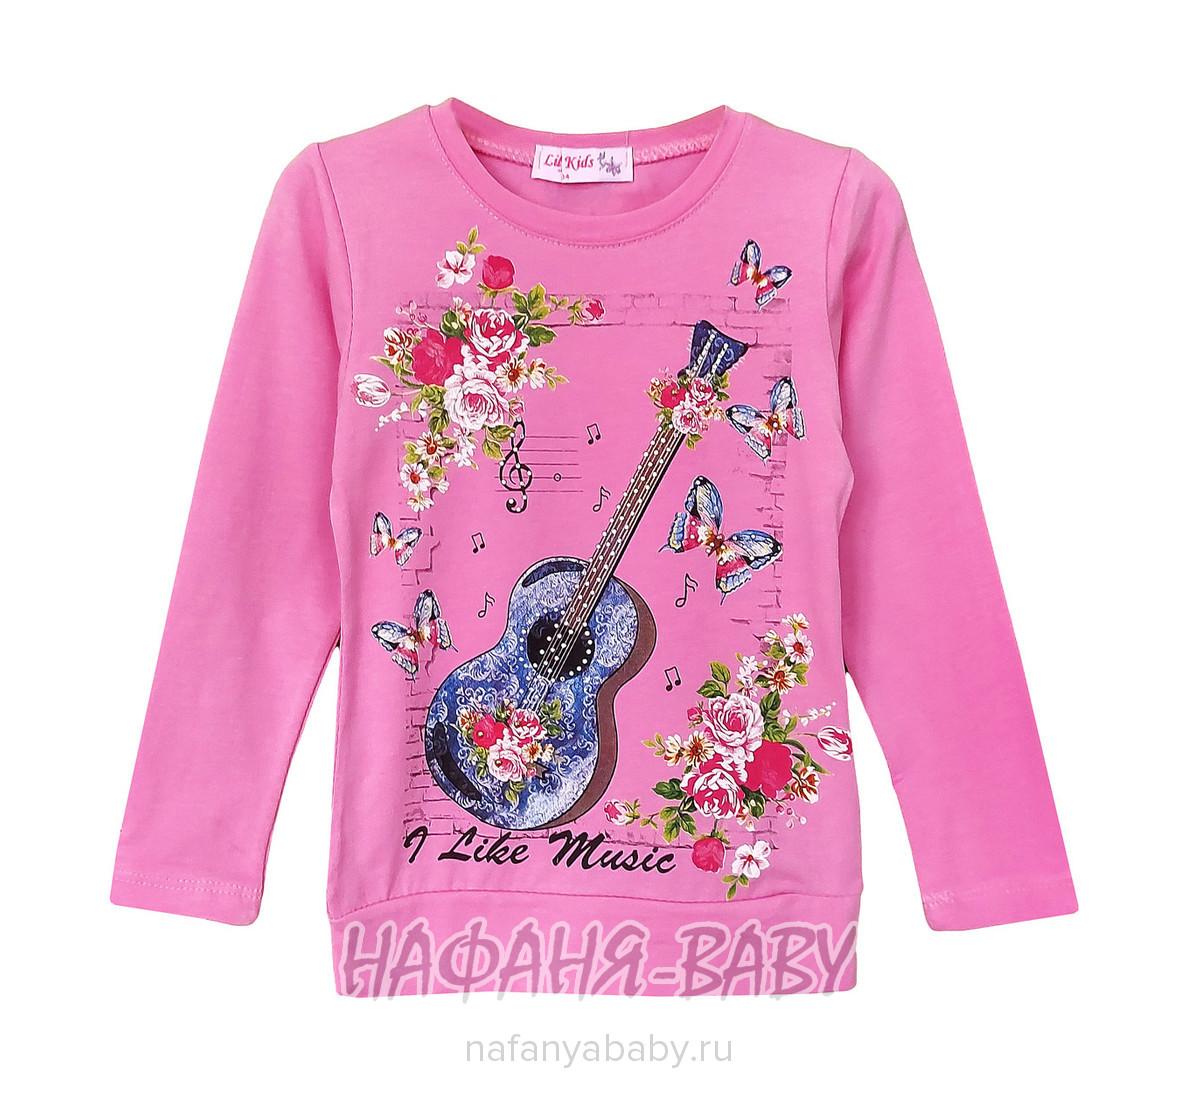 Свитшот ЛЮБЛЮ МУЗЫКУ LILI KIDS арт: 2257, 1-4 года, 5-9 лет, цвет розовый, оптом Турция